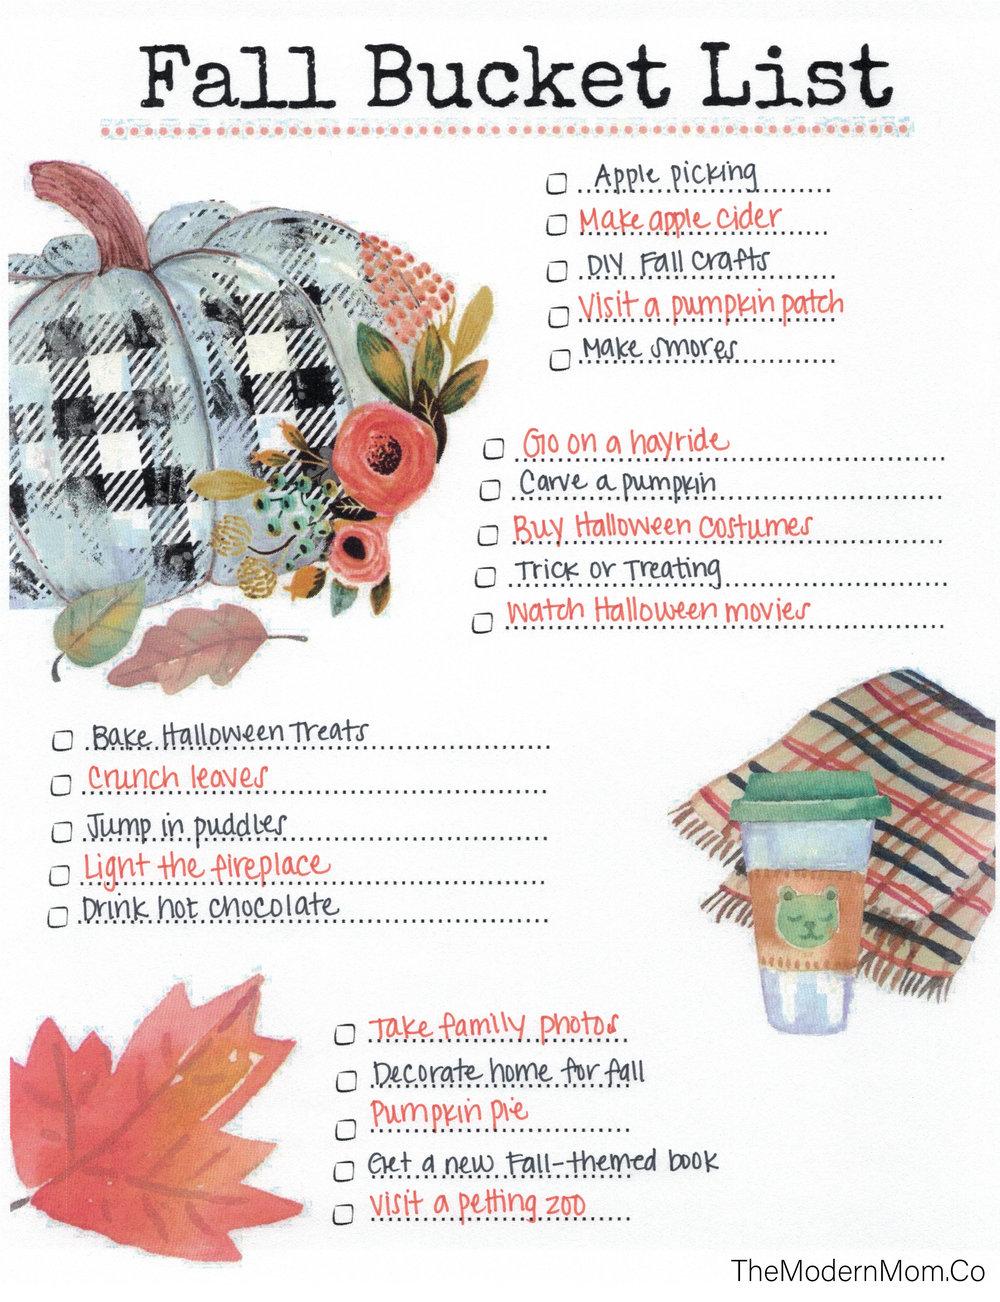 Fall bucket list10022018.jpg